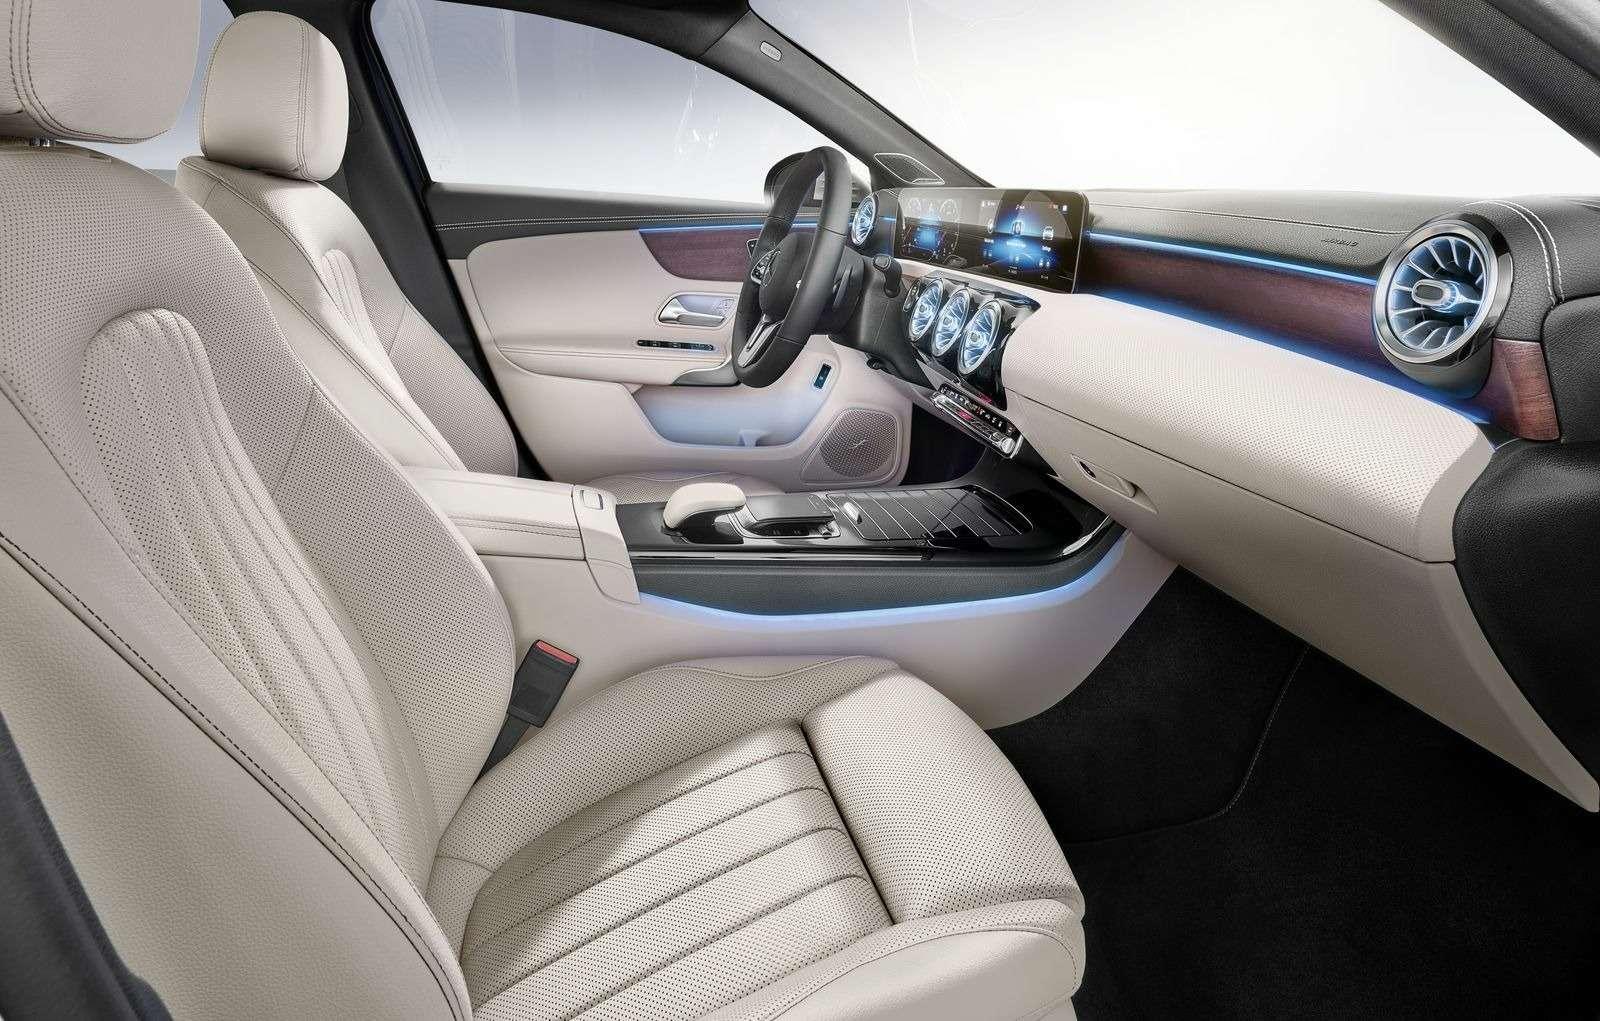 Евростандарт: представлен короткий седан Mercedes-Benz A-класса— фото 890438